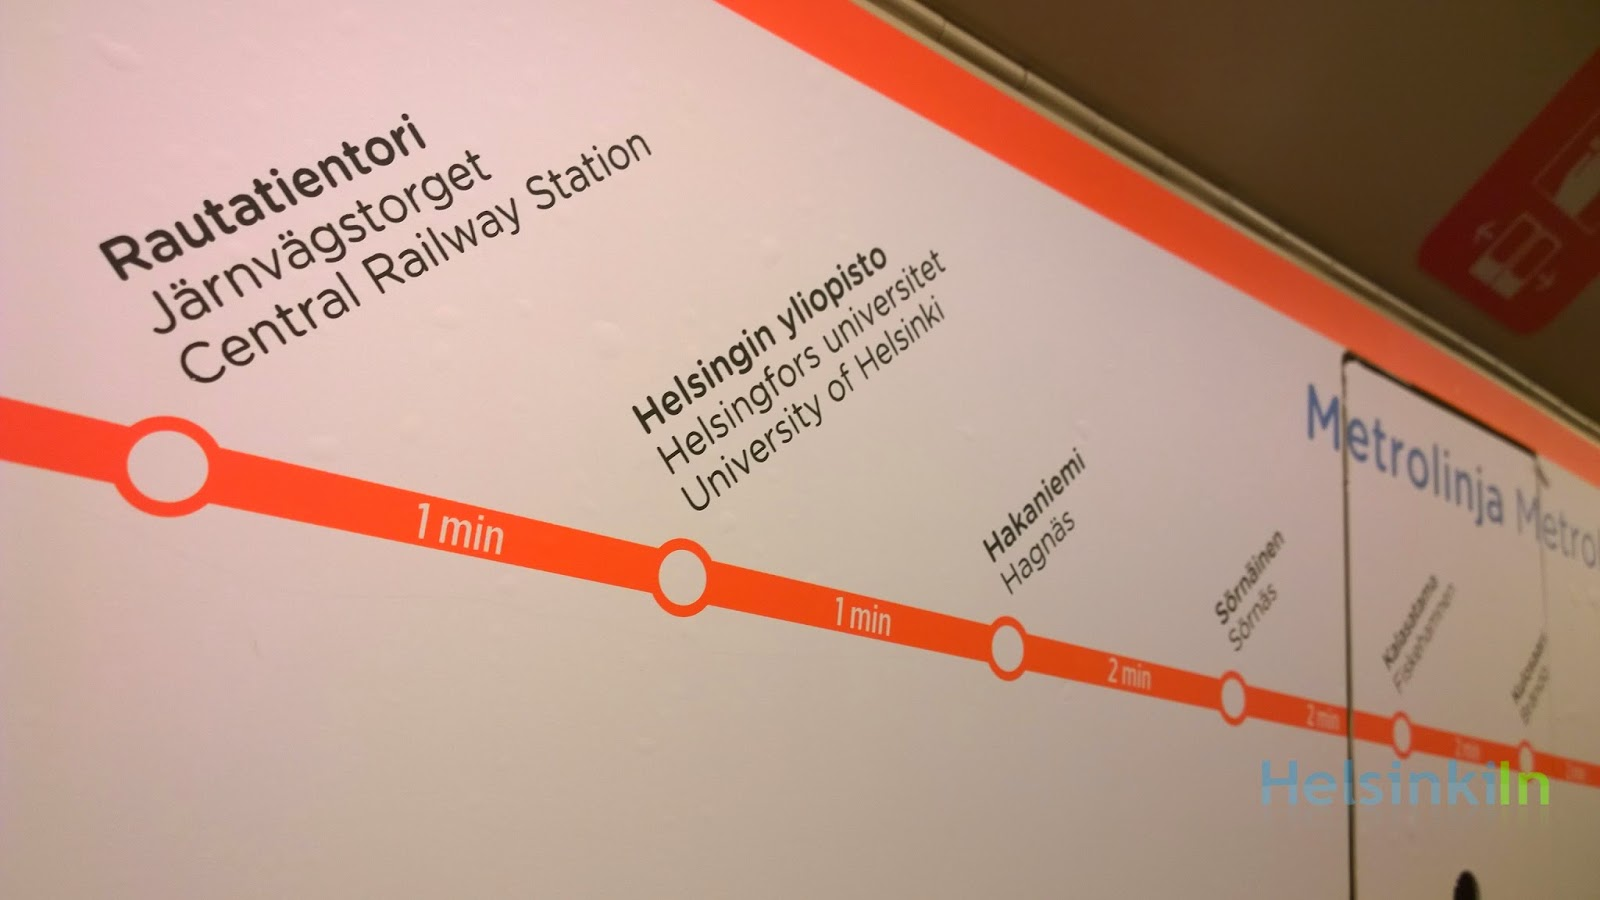 Helsinki's new metro station